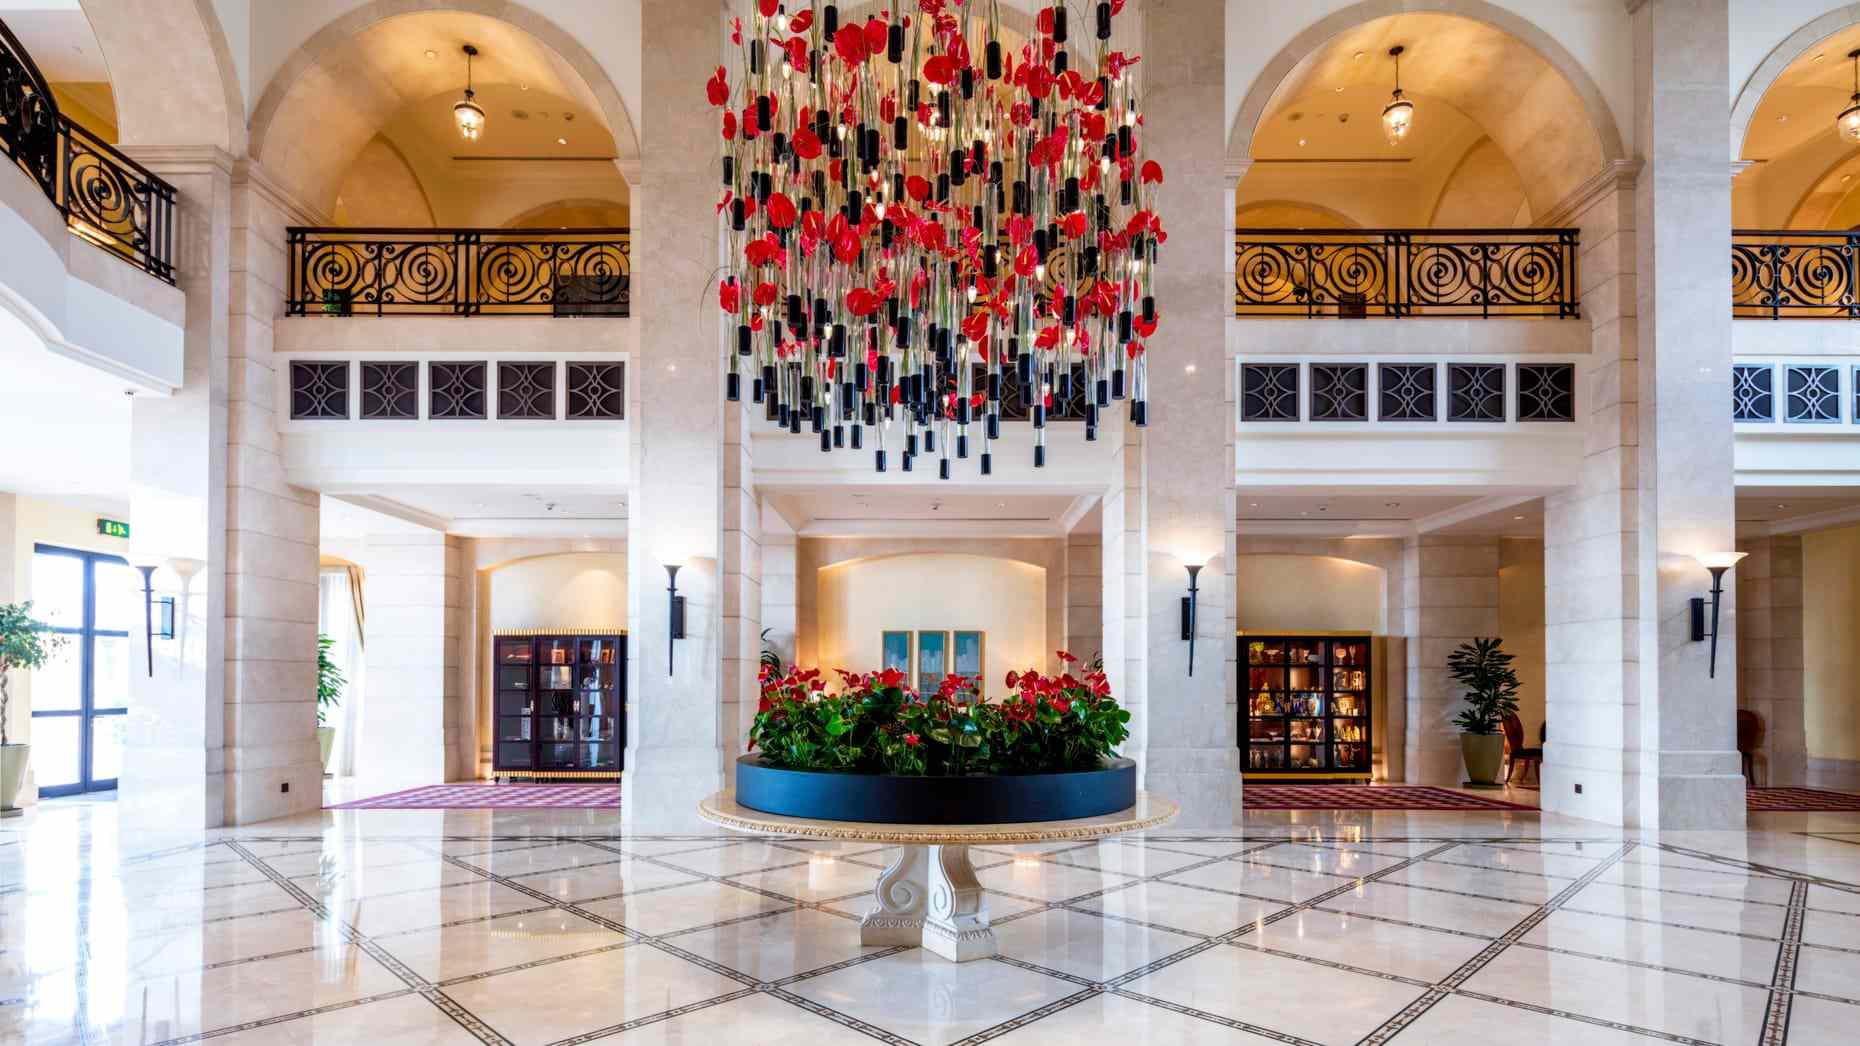 Lobby to Four Seasons Hotel Amman